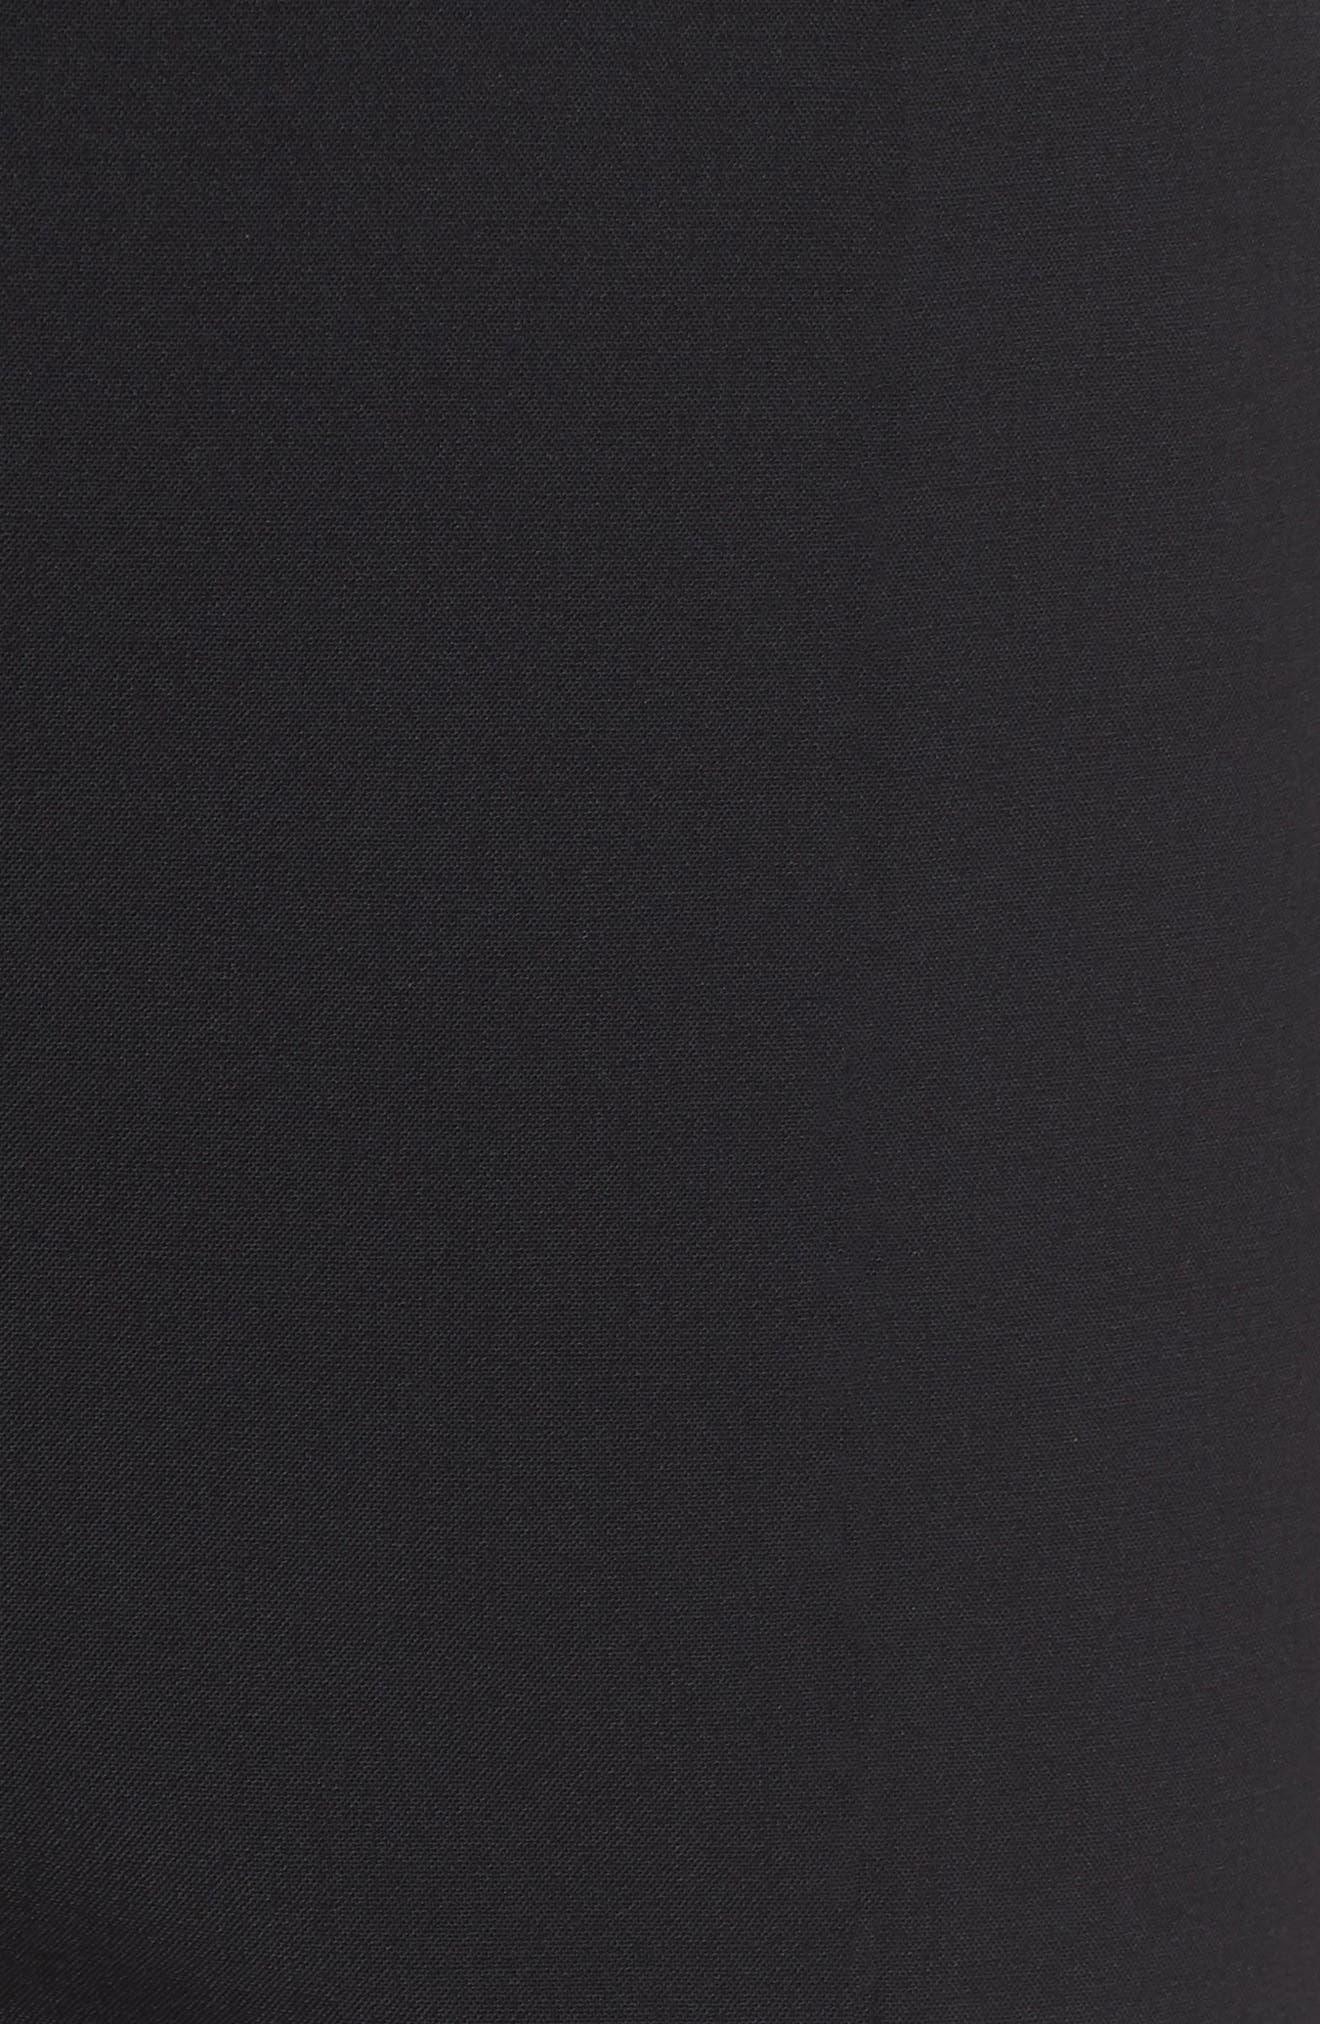 Slit Detail Cigarette Pants,                             Alternate thumbnail 6, color,                             001